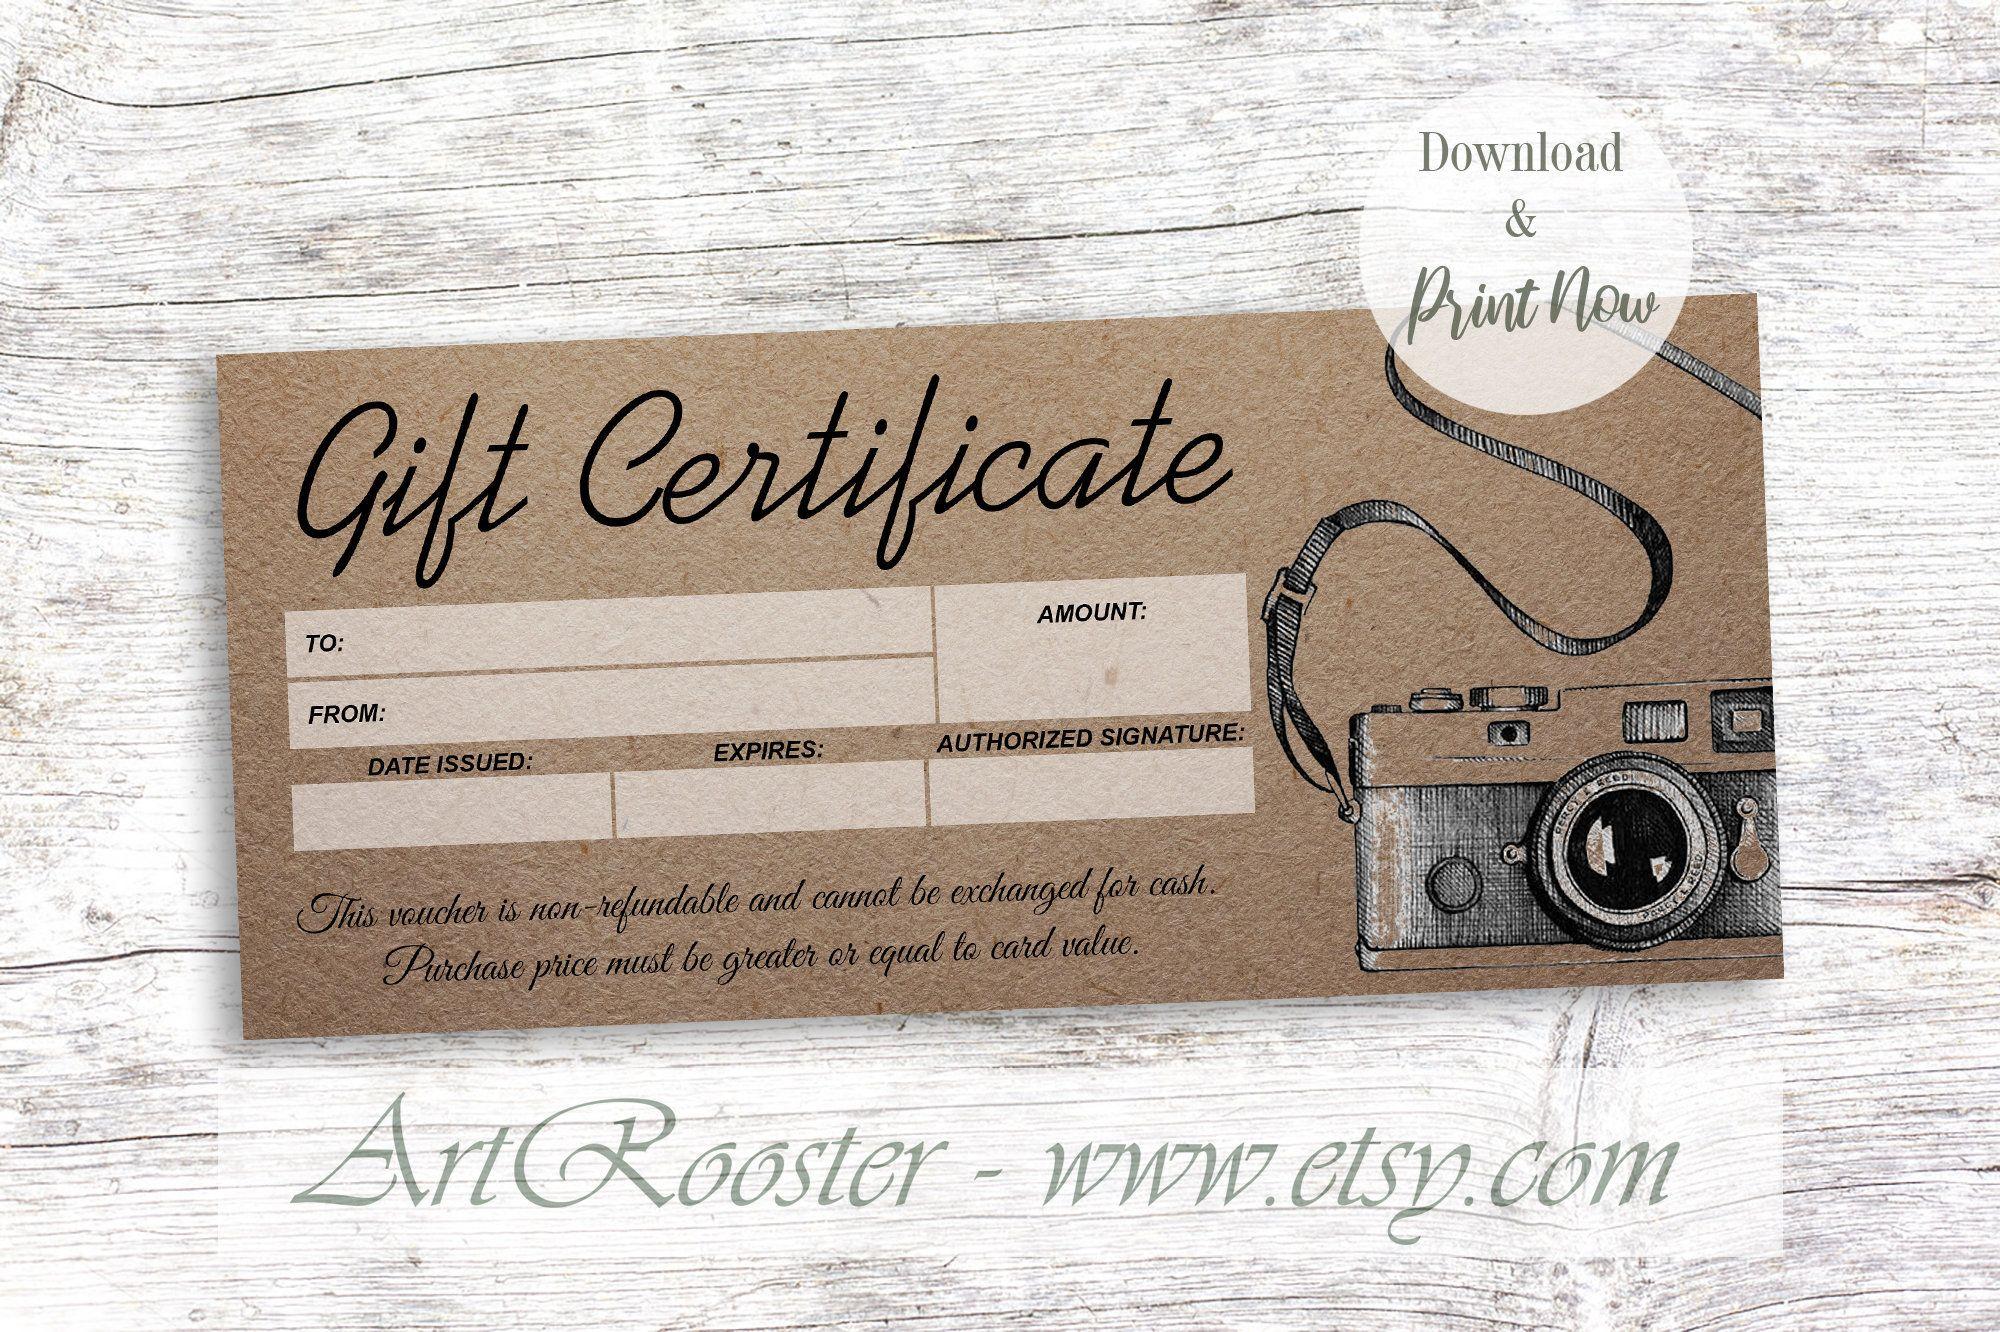 Giftcertificate Printablegiftcertificate Printablegiftcertificatetemplate Printa Photography Gift Certificate Printable Gift Certificate Gift Card Template